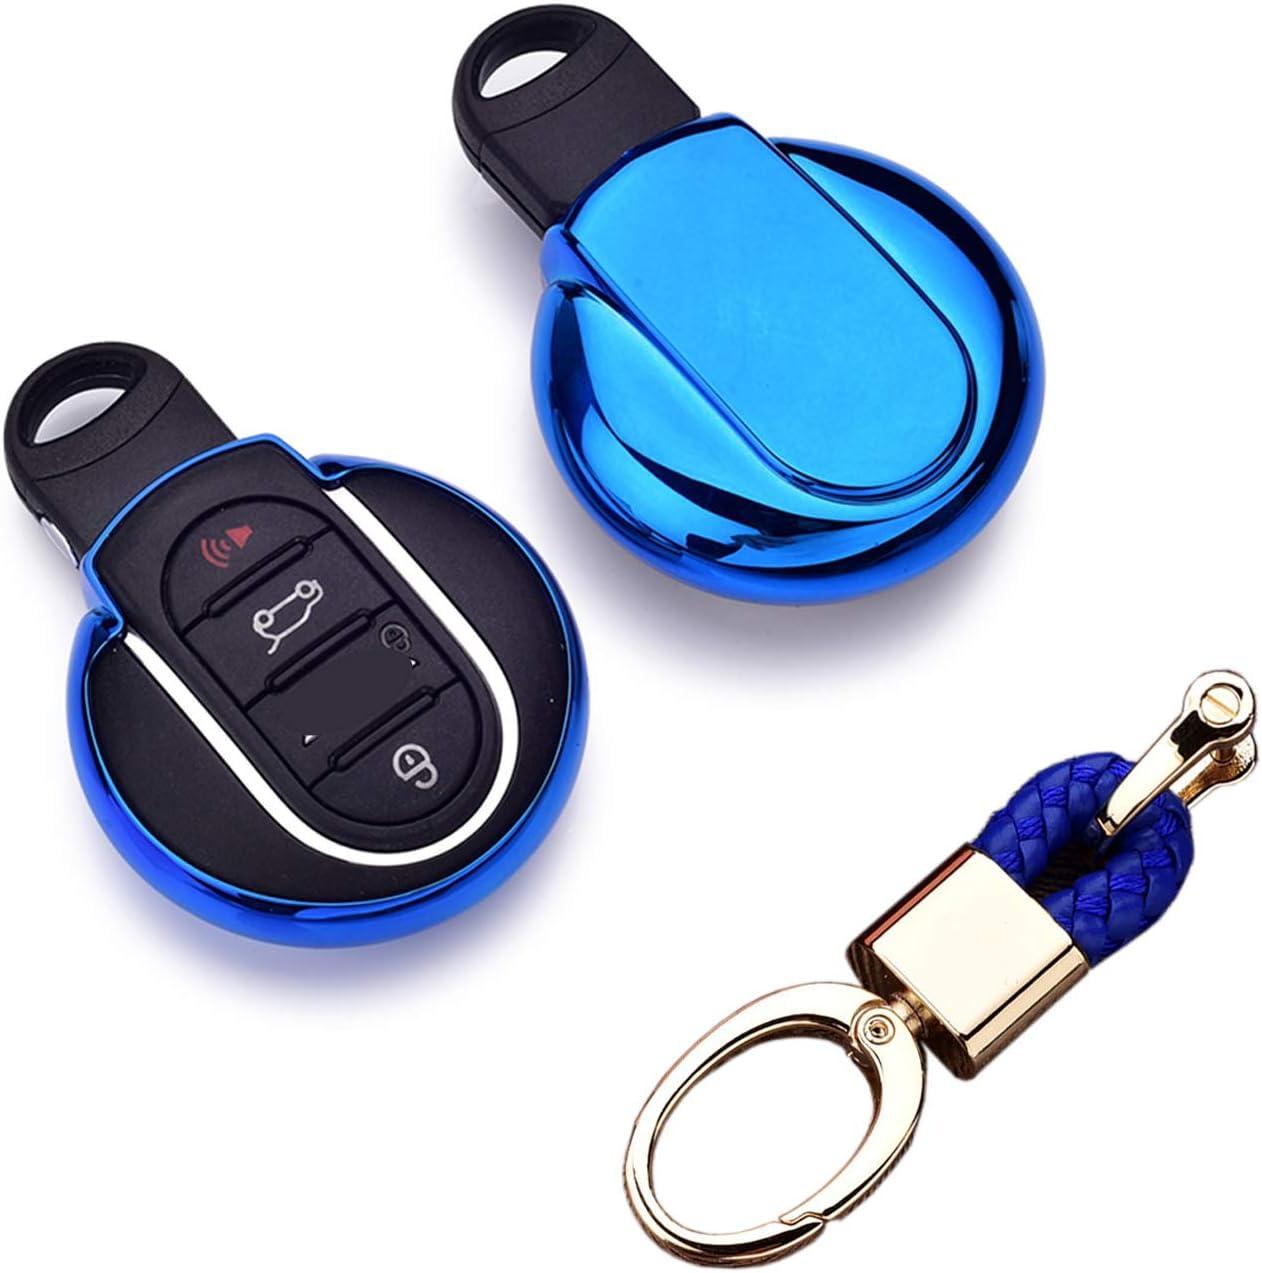 Royalfox(TM) Luxury 3 4 Buttons Soft TPU Smart Remote Key Fob ca